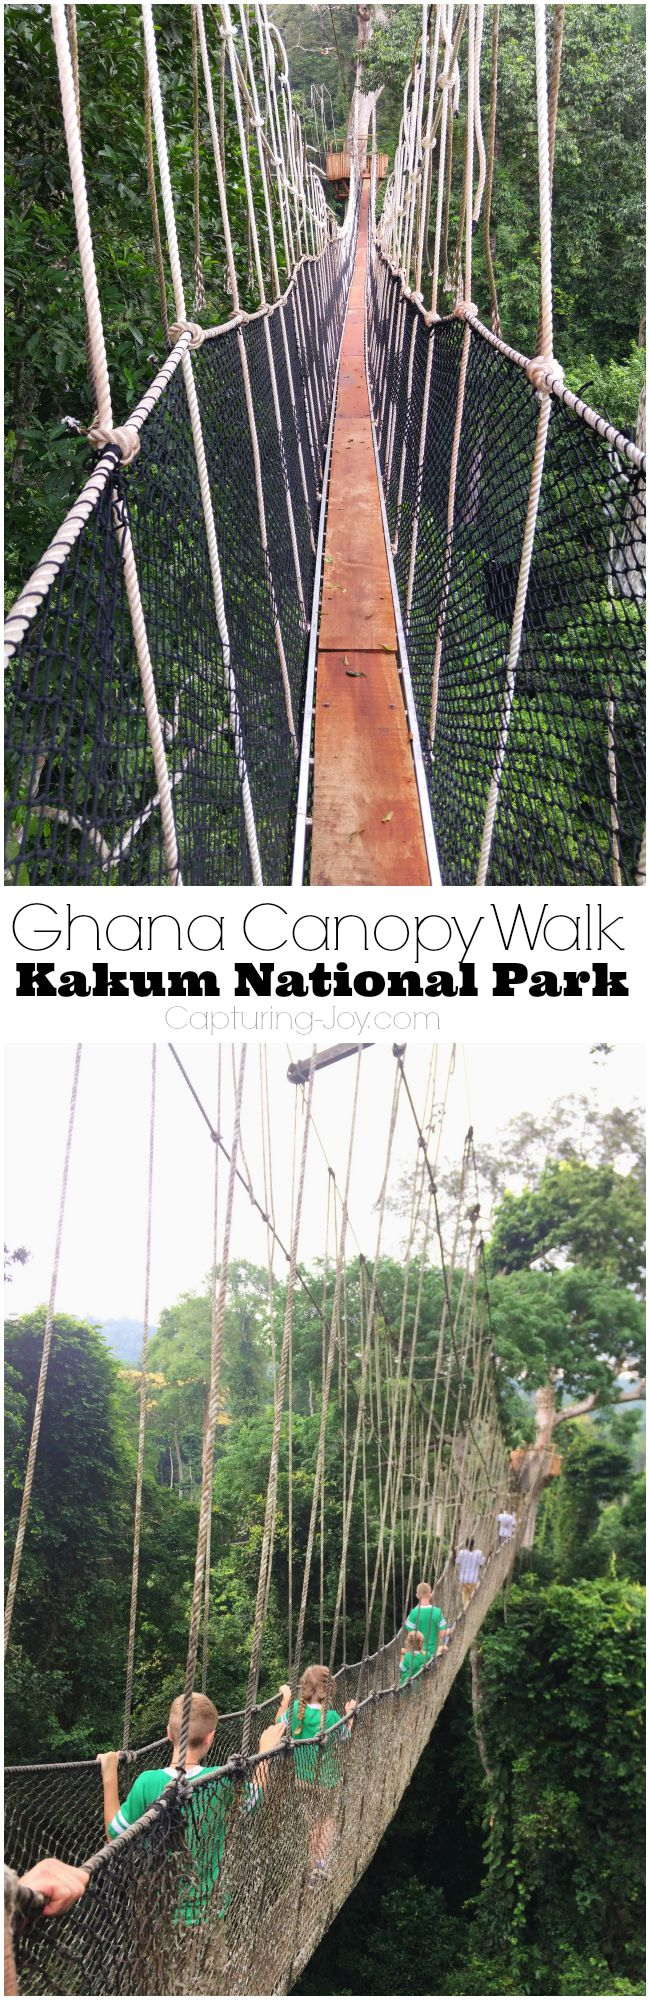 Ghana Canopy Walk Kakum National Park